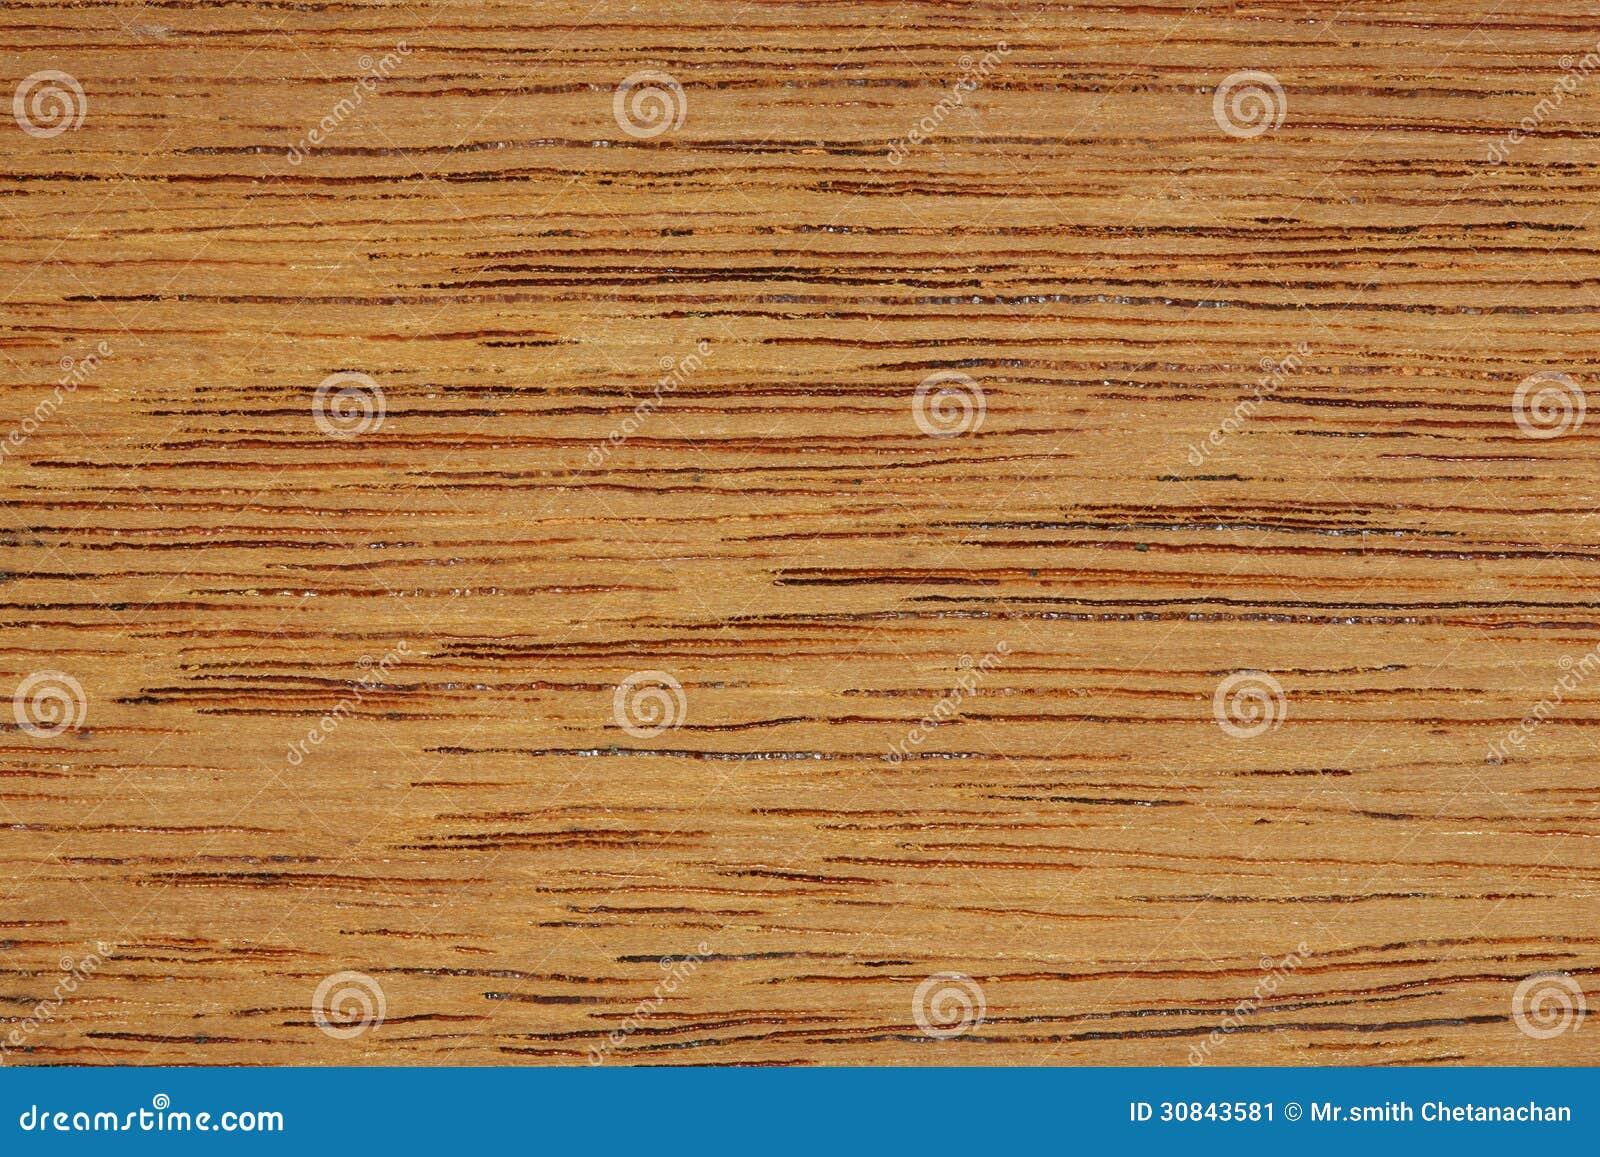 текстура древесины: